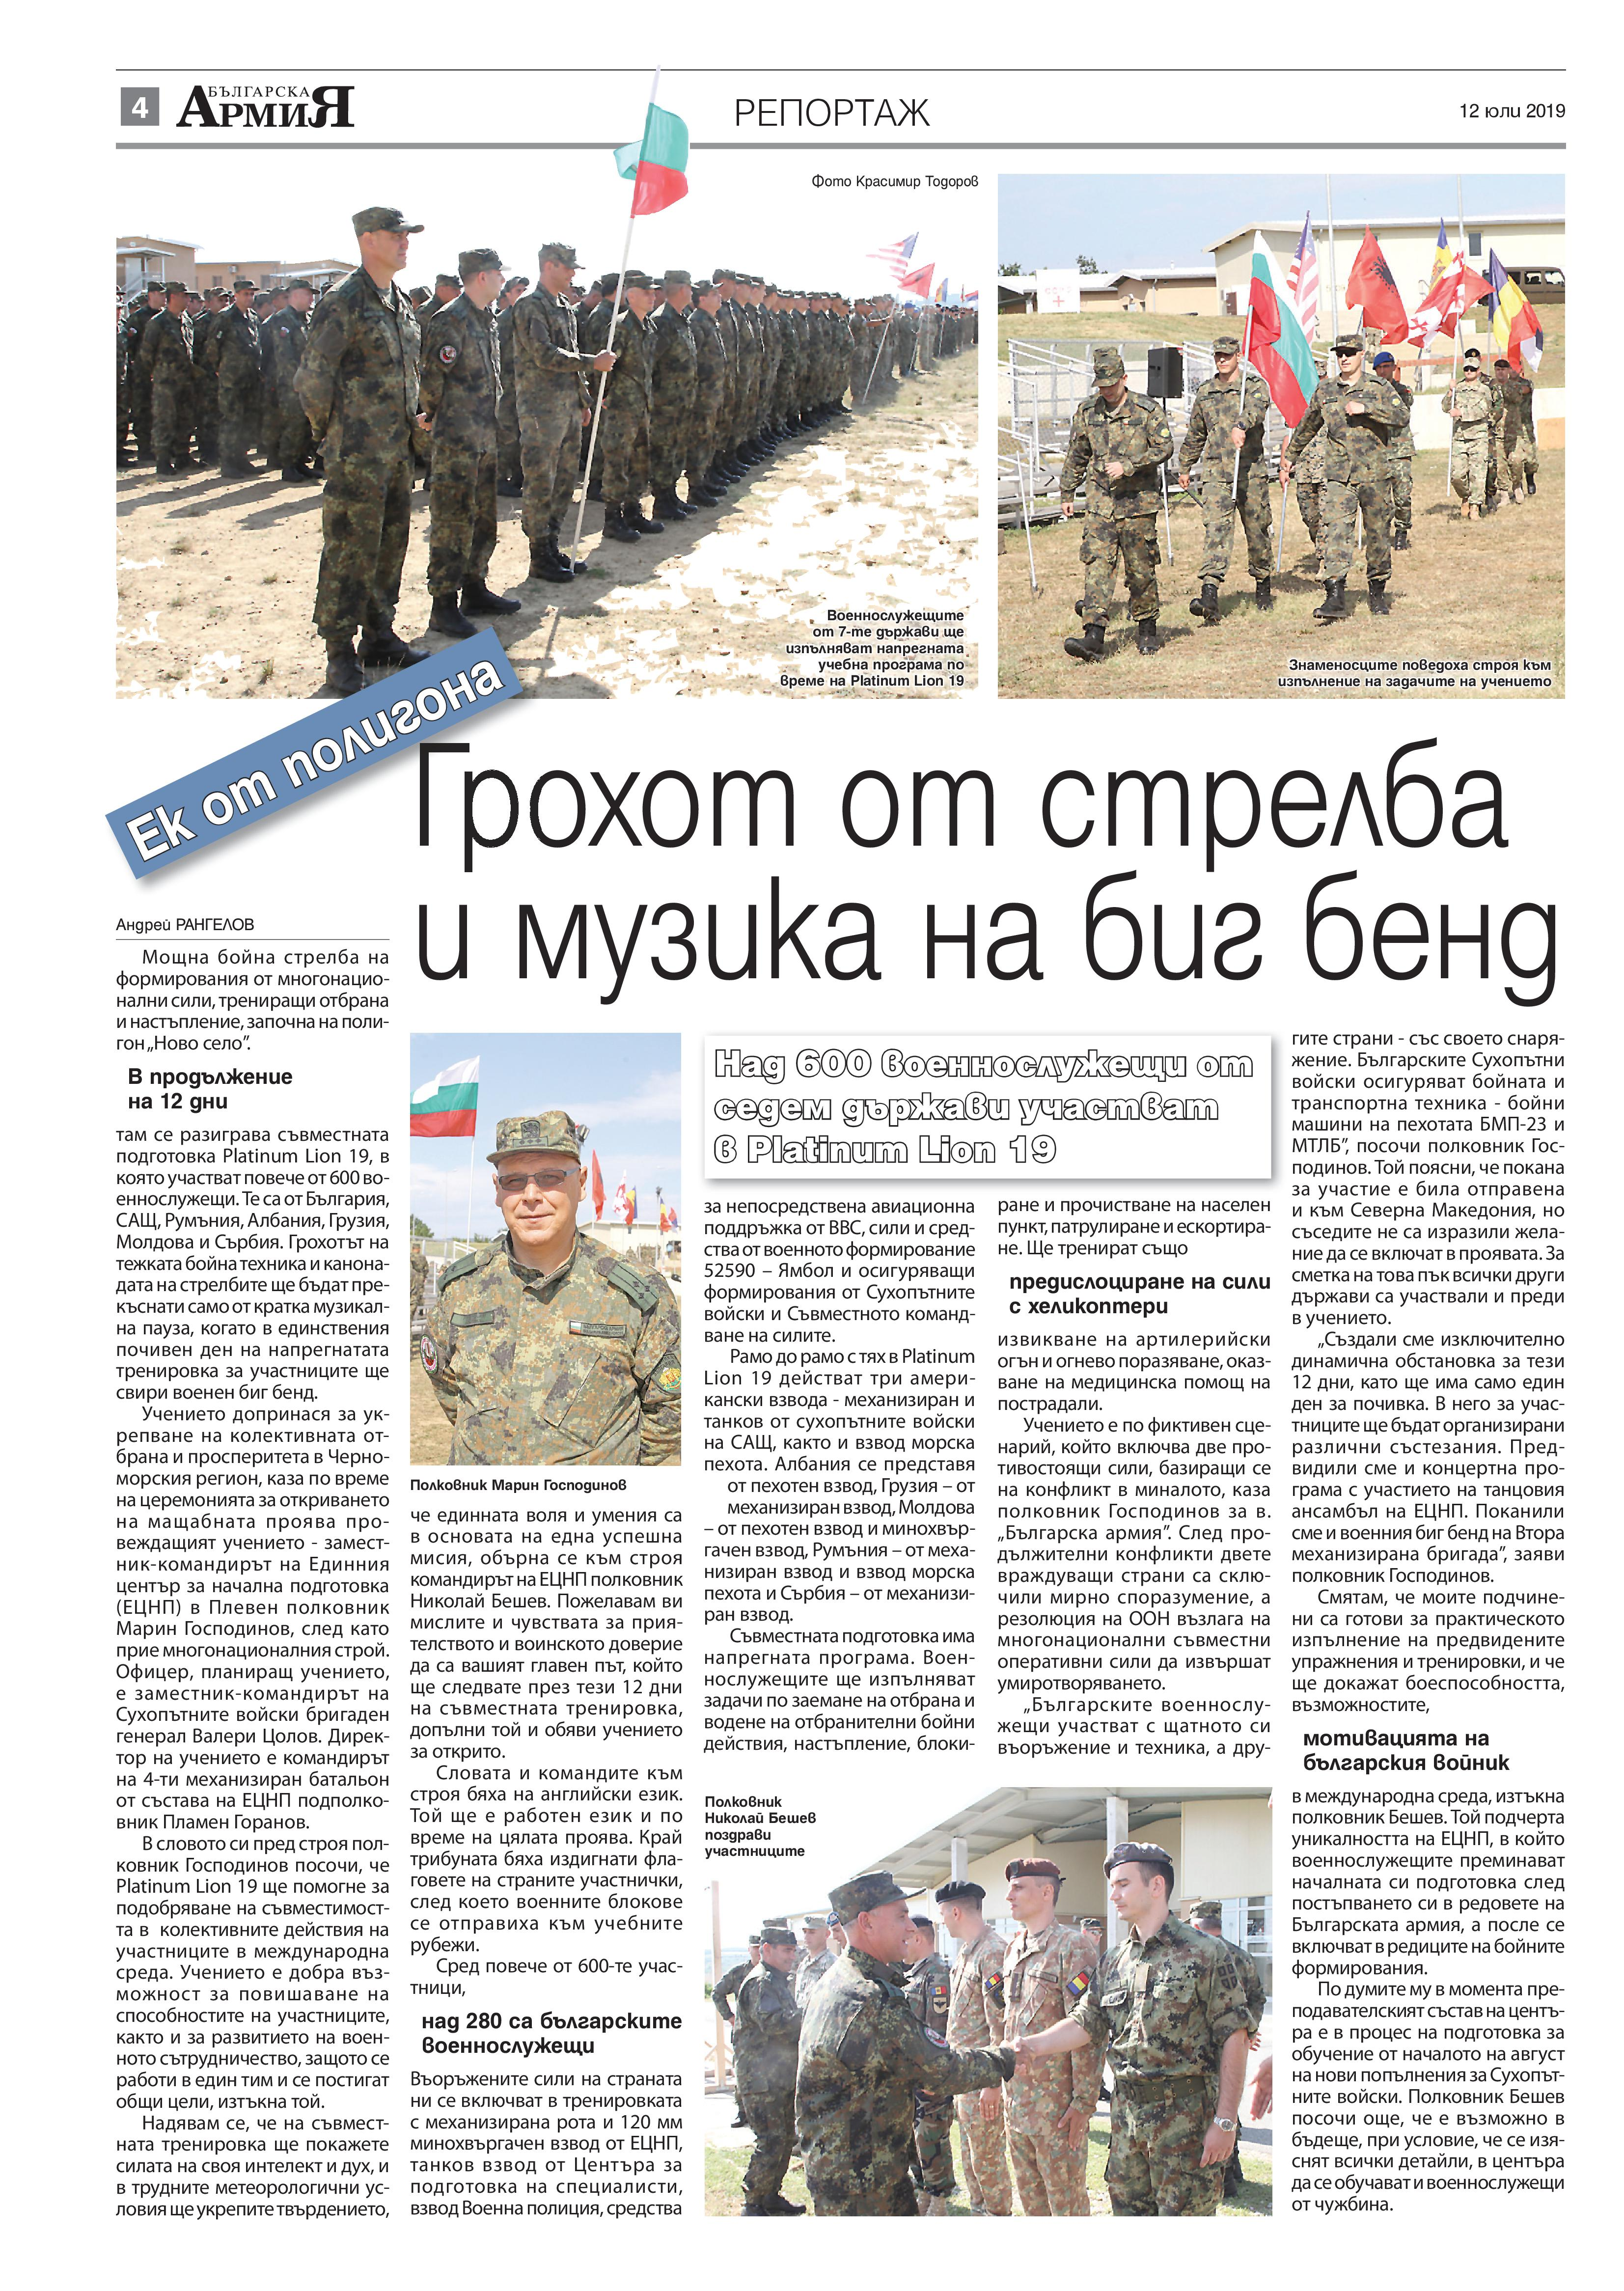 https://www.armymedia.bg/wp-content/uploads/2015/06/04-28.jpg